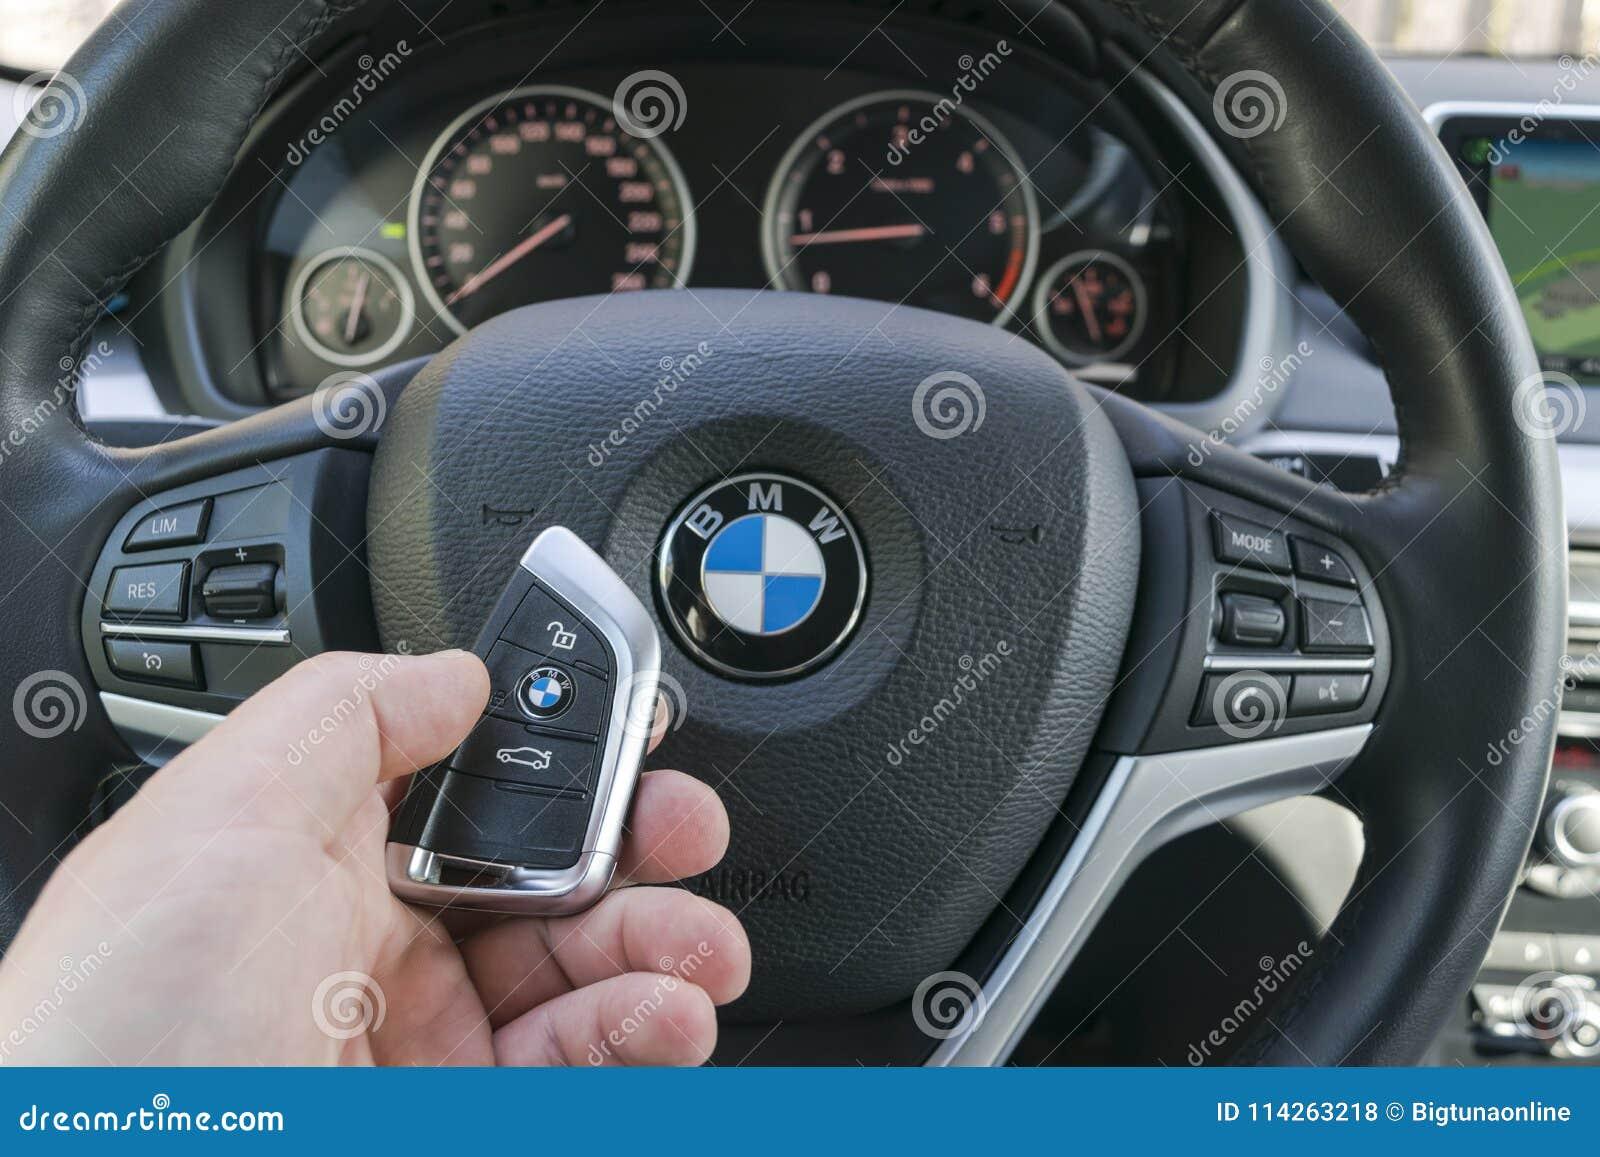 Man S Hand Holding A Wireless Bmw X5 F15 Car Key In Black Leather